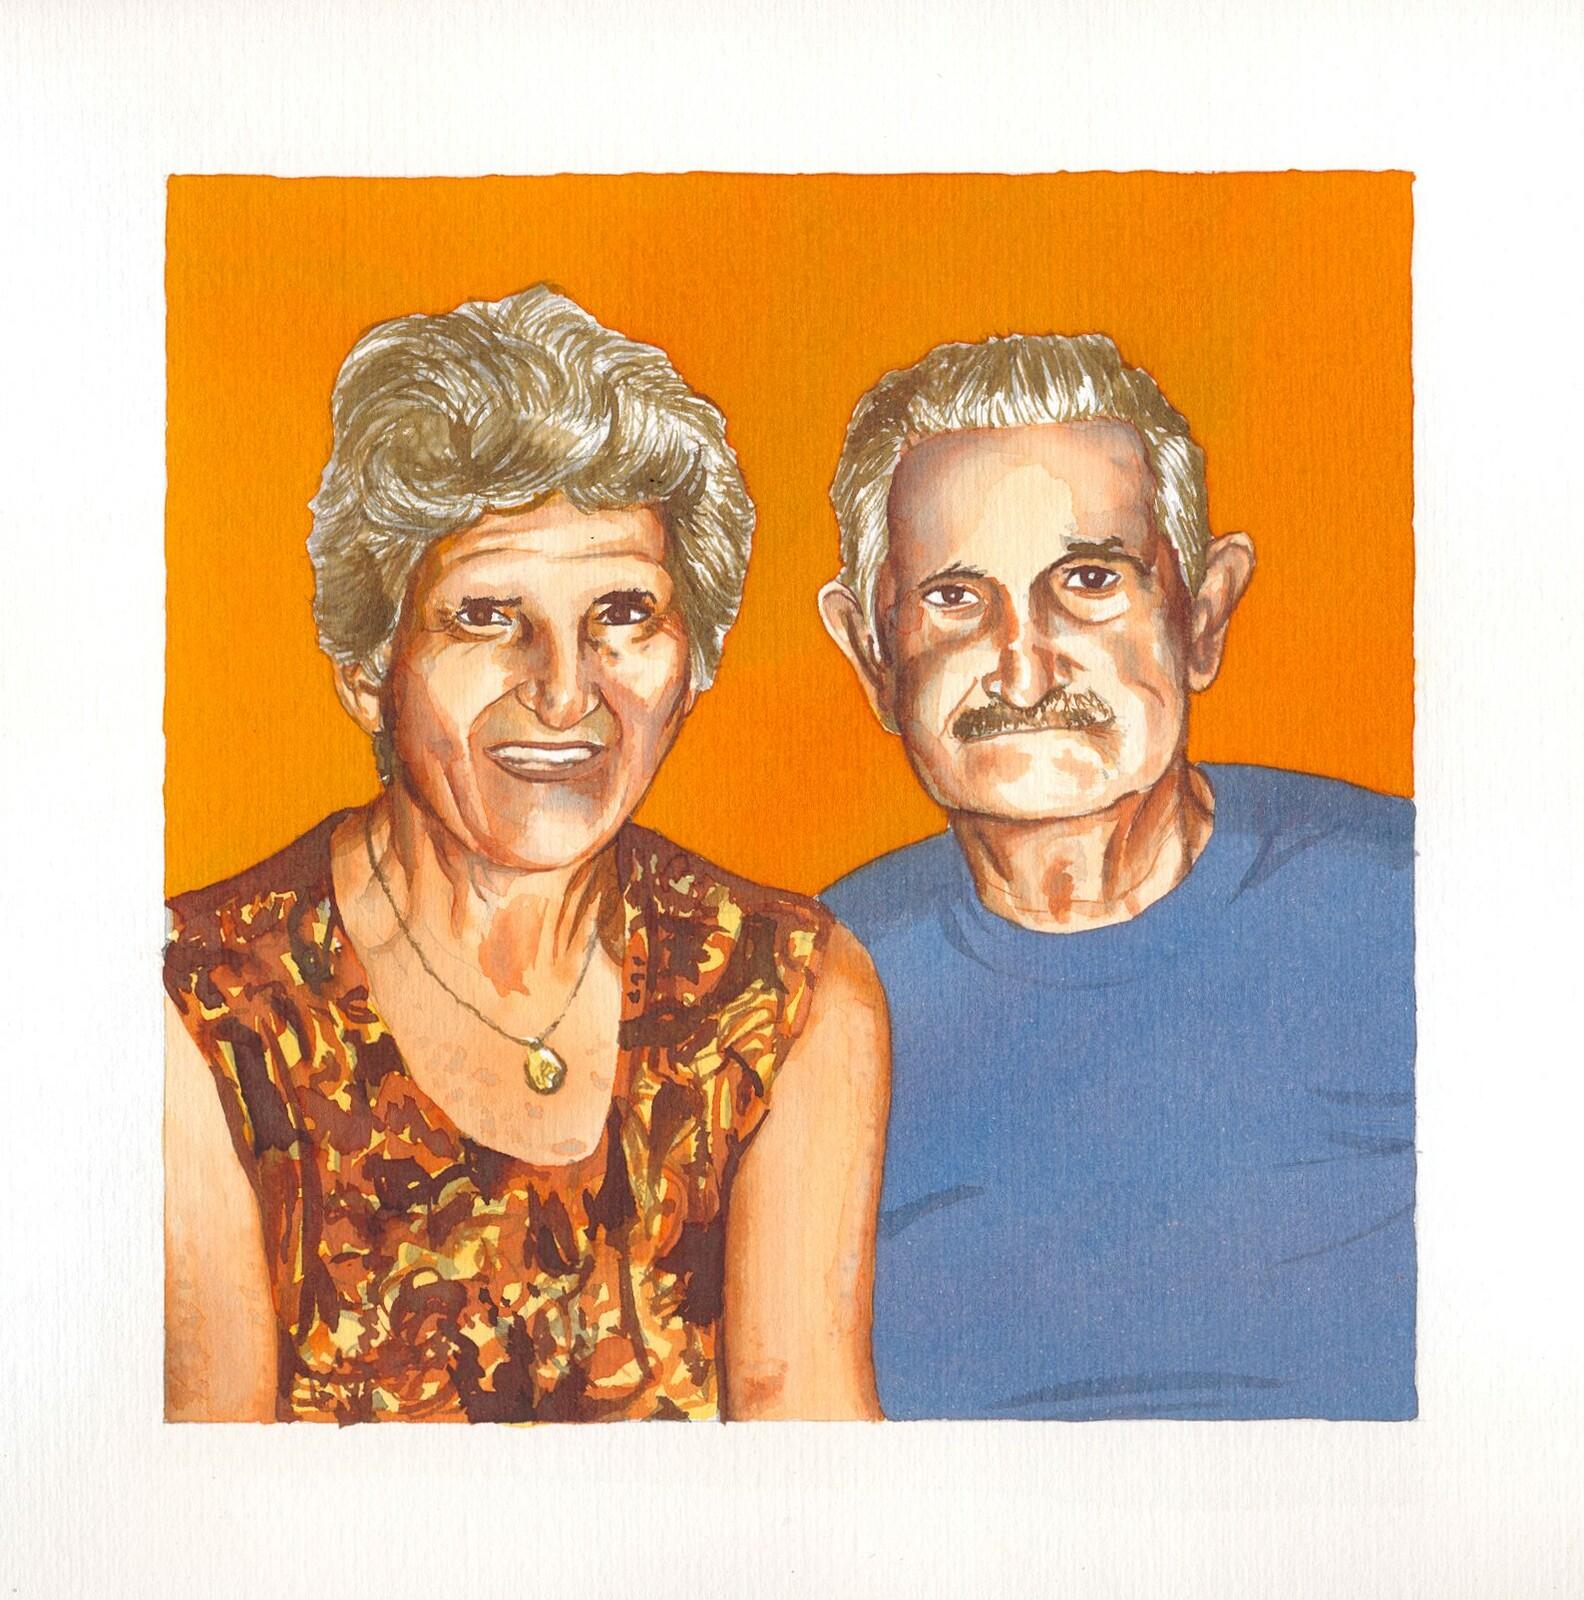 My late grandparents.